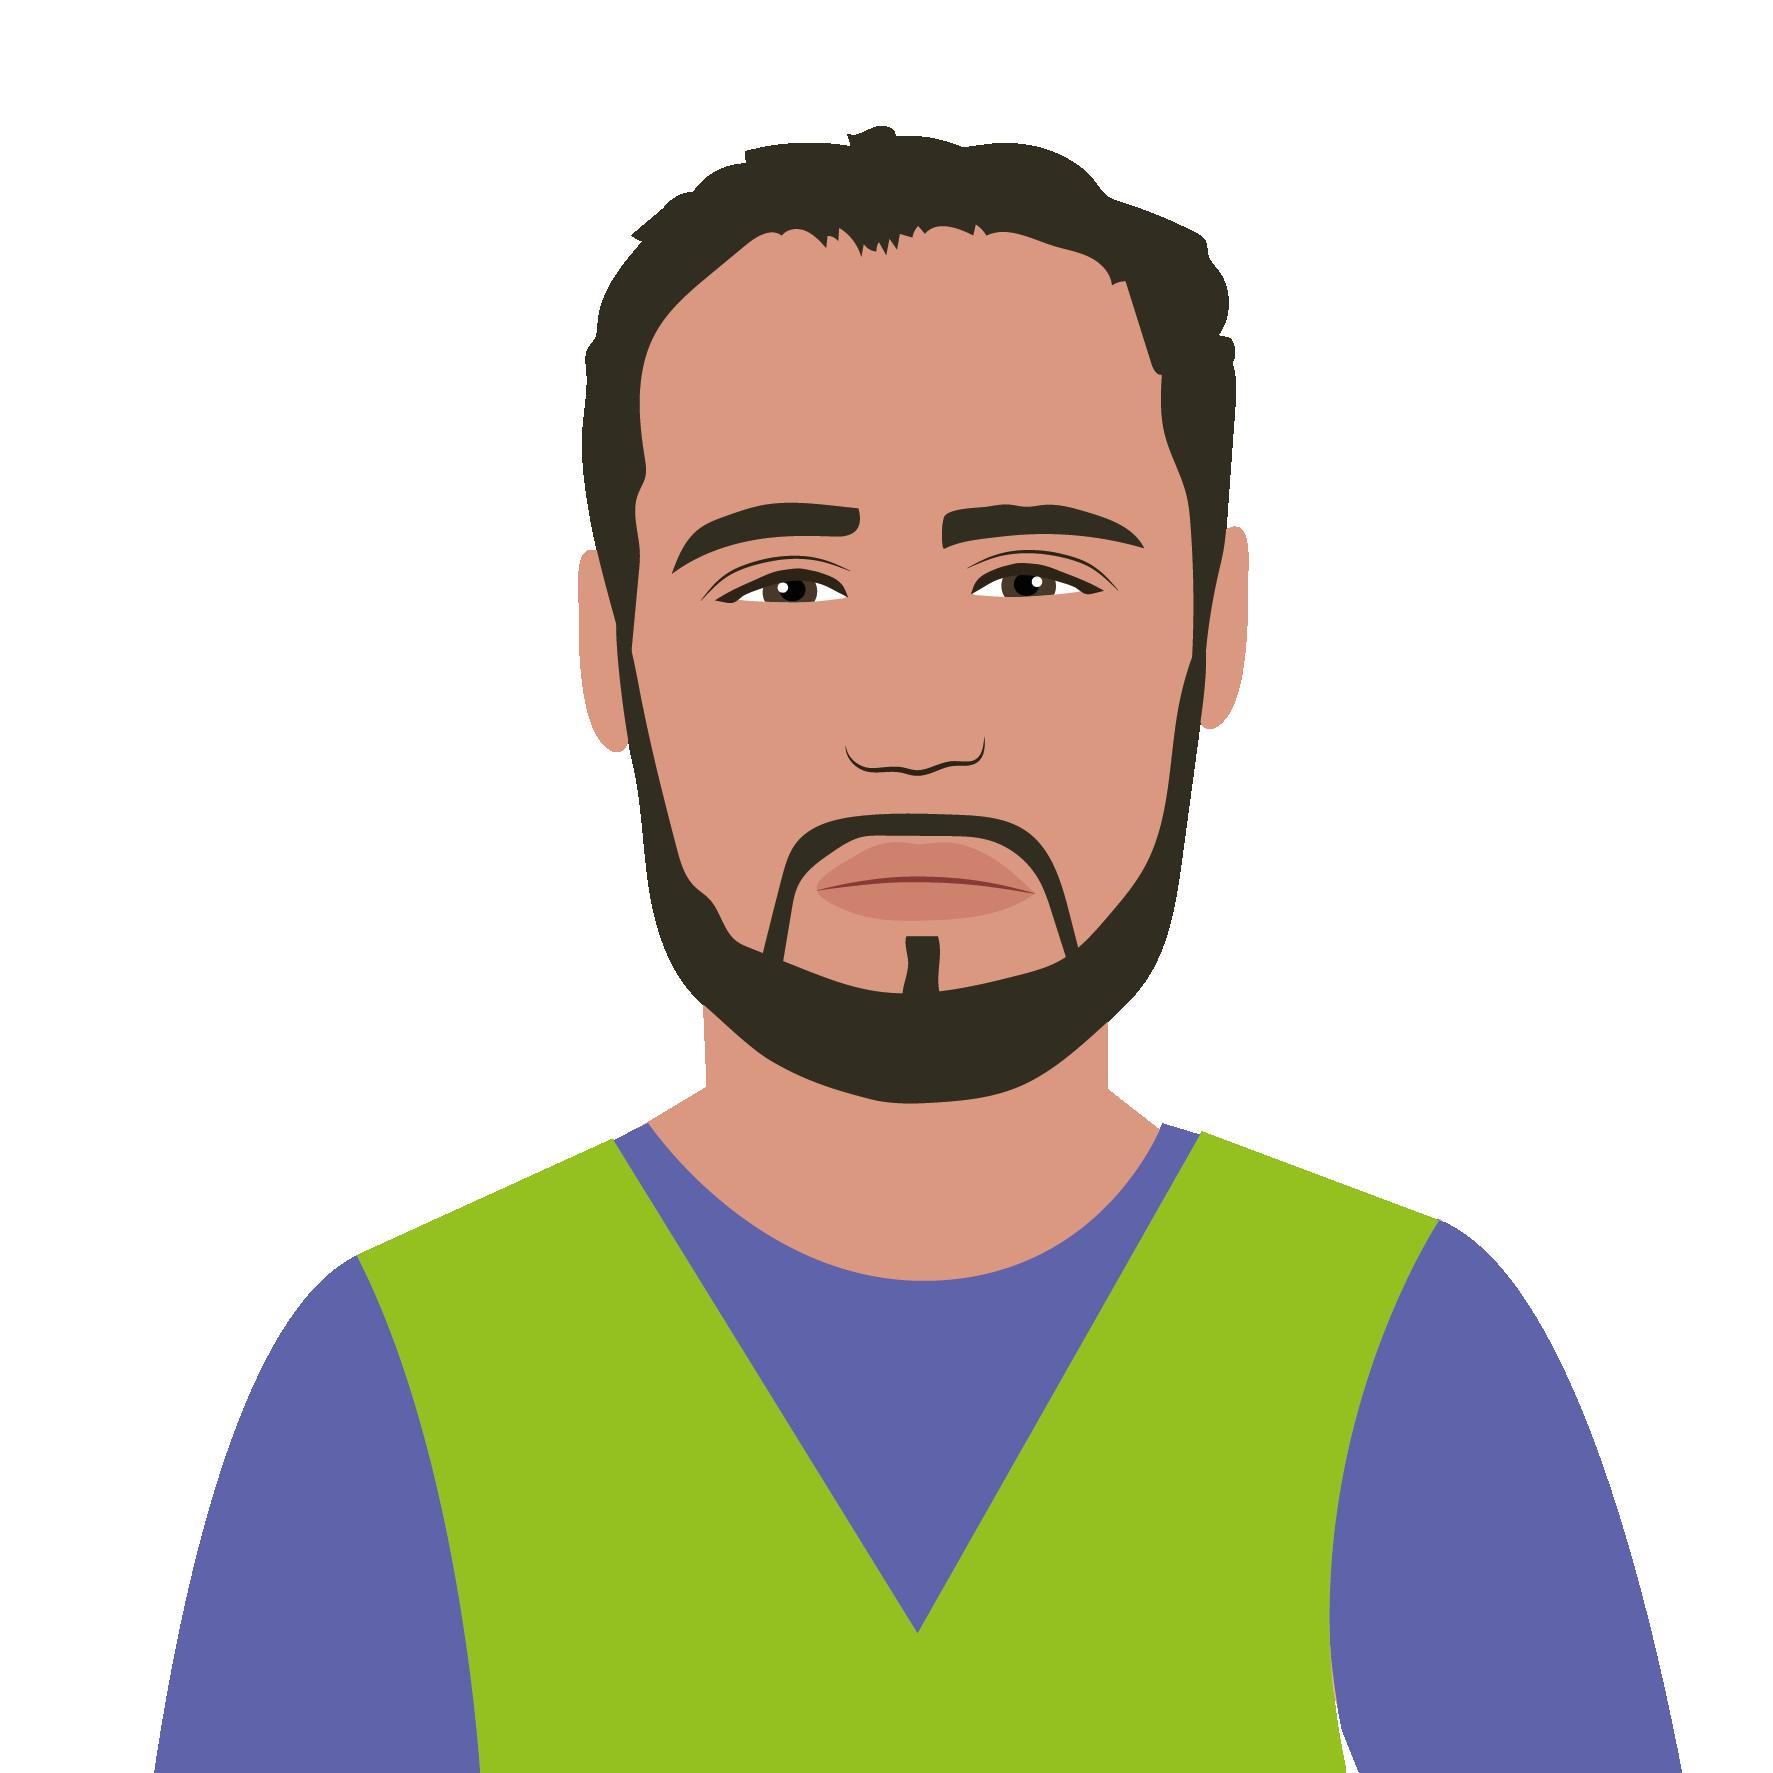 jaquier_habefast_illu_employes-paulo